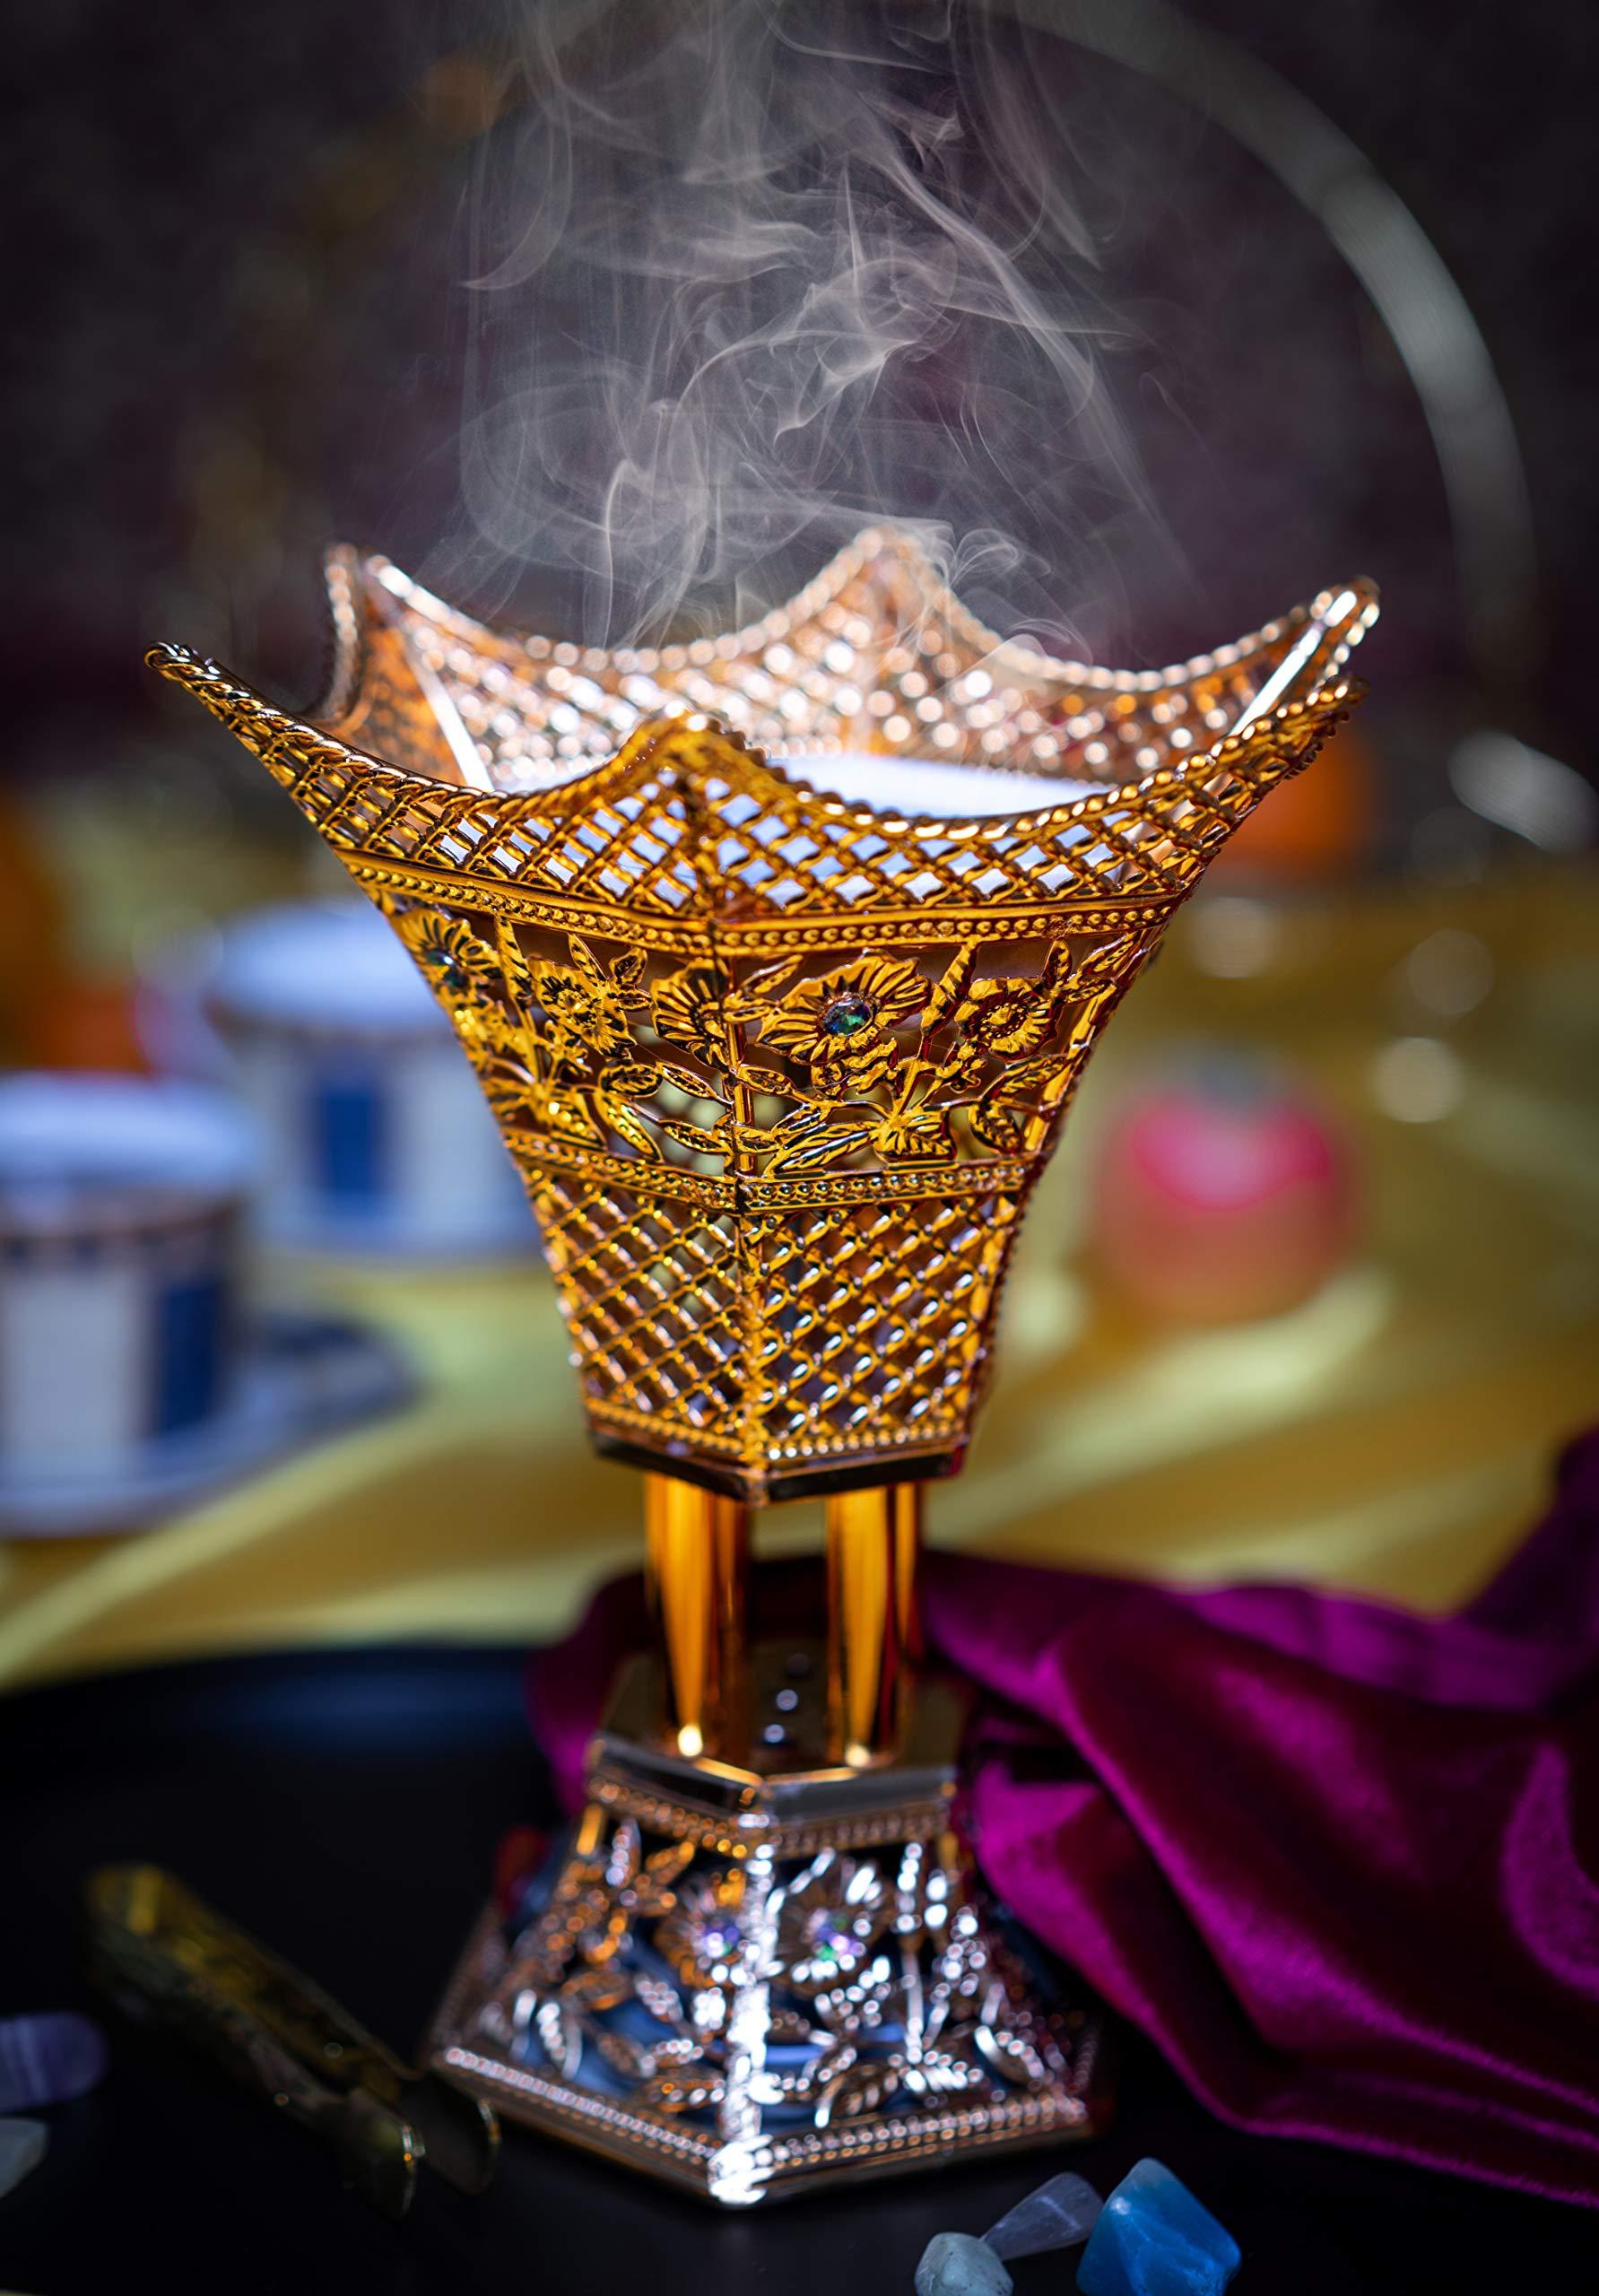 AM Bakhoor Charcoal Incense Burner - Oud Frankincense Resin Burner 10.5 Inches Tall - for Bakhoor Oud Incense Sticks Cones - Luxury Filigree, Gold by AM (Image #7)